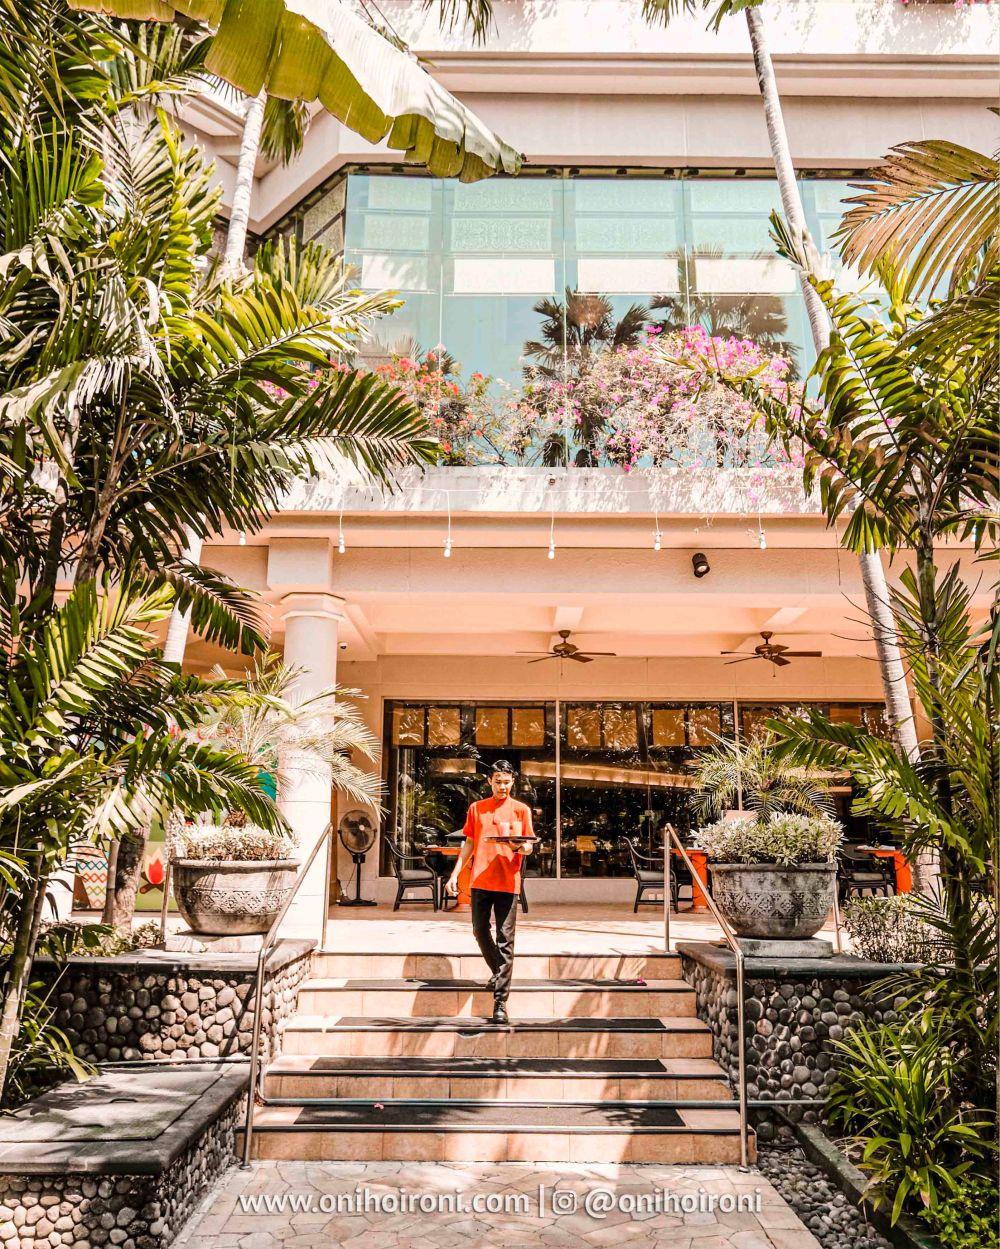 3 Review food Jamoo Restaurant Shangrila Surabaya Hotel Oni hoironi